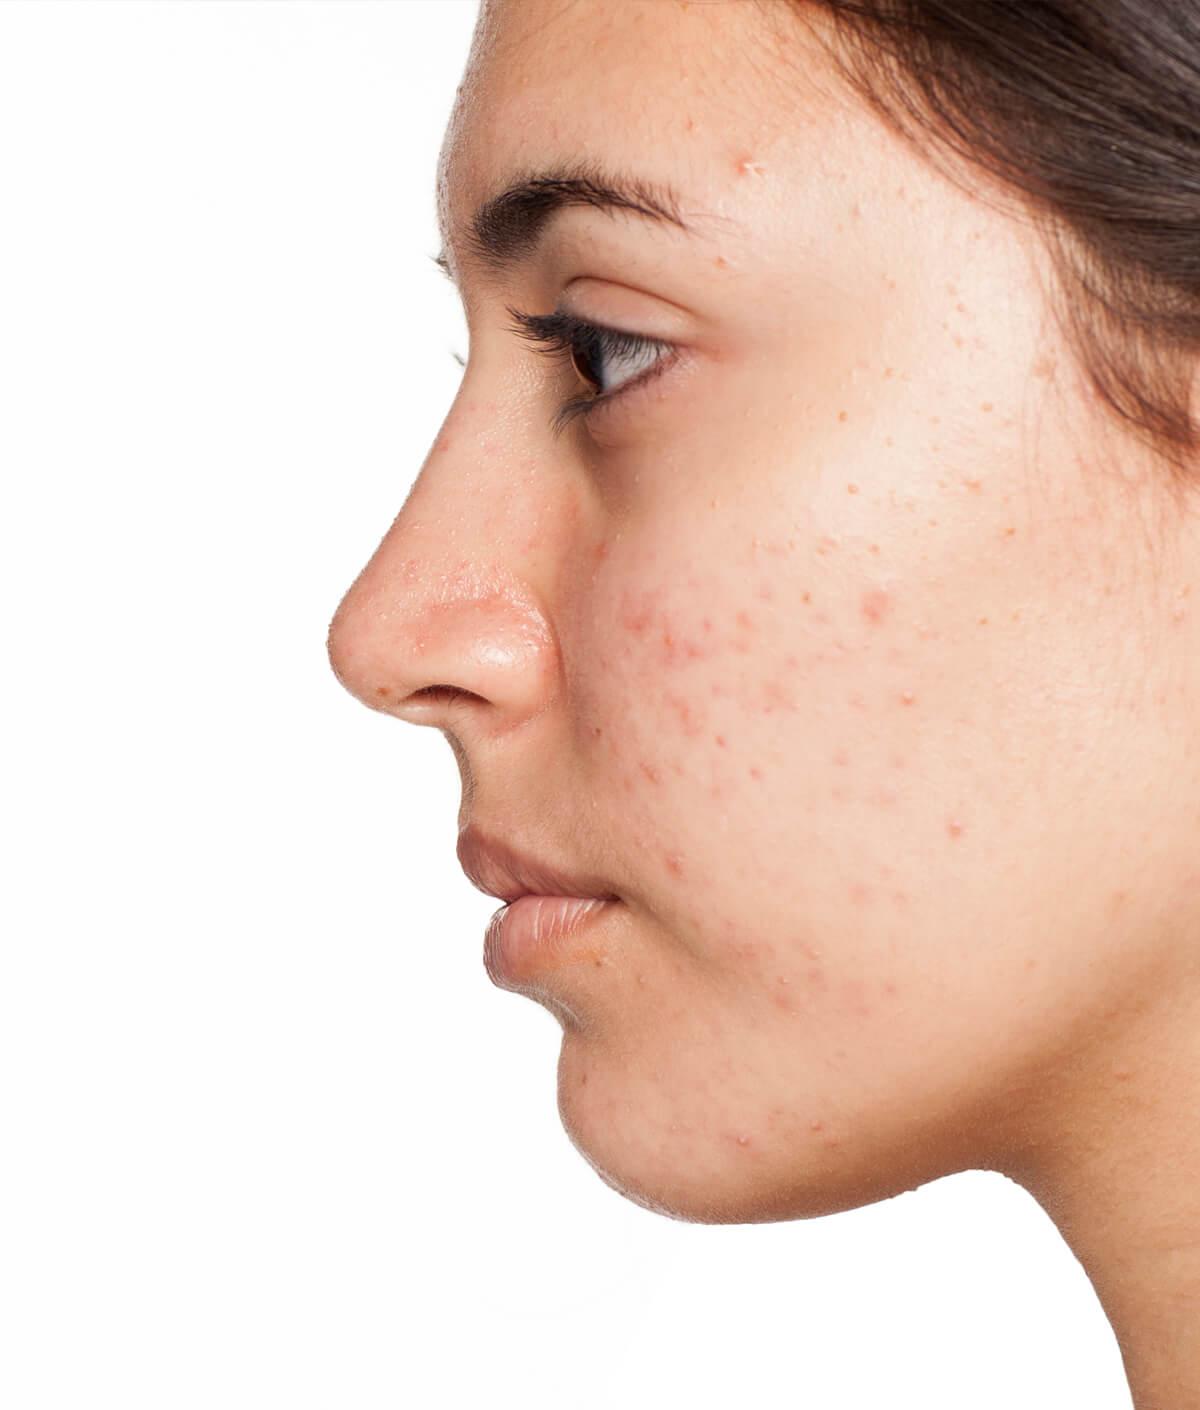 Acne - Cairns Dermatology